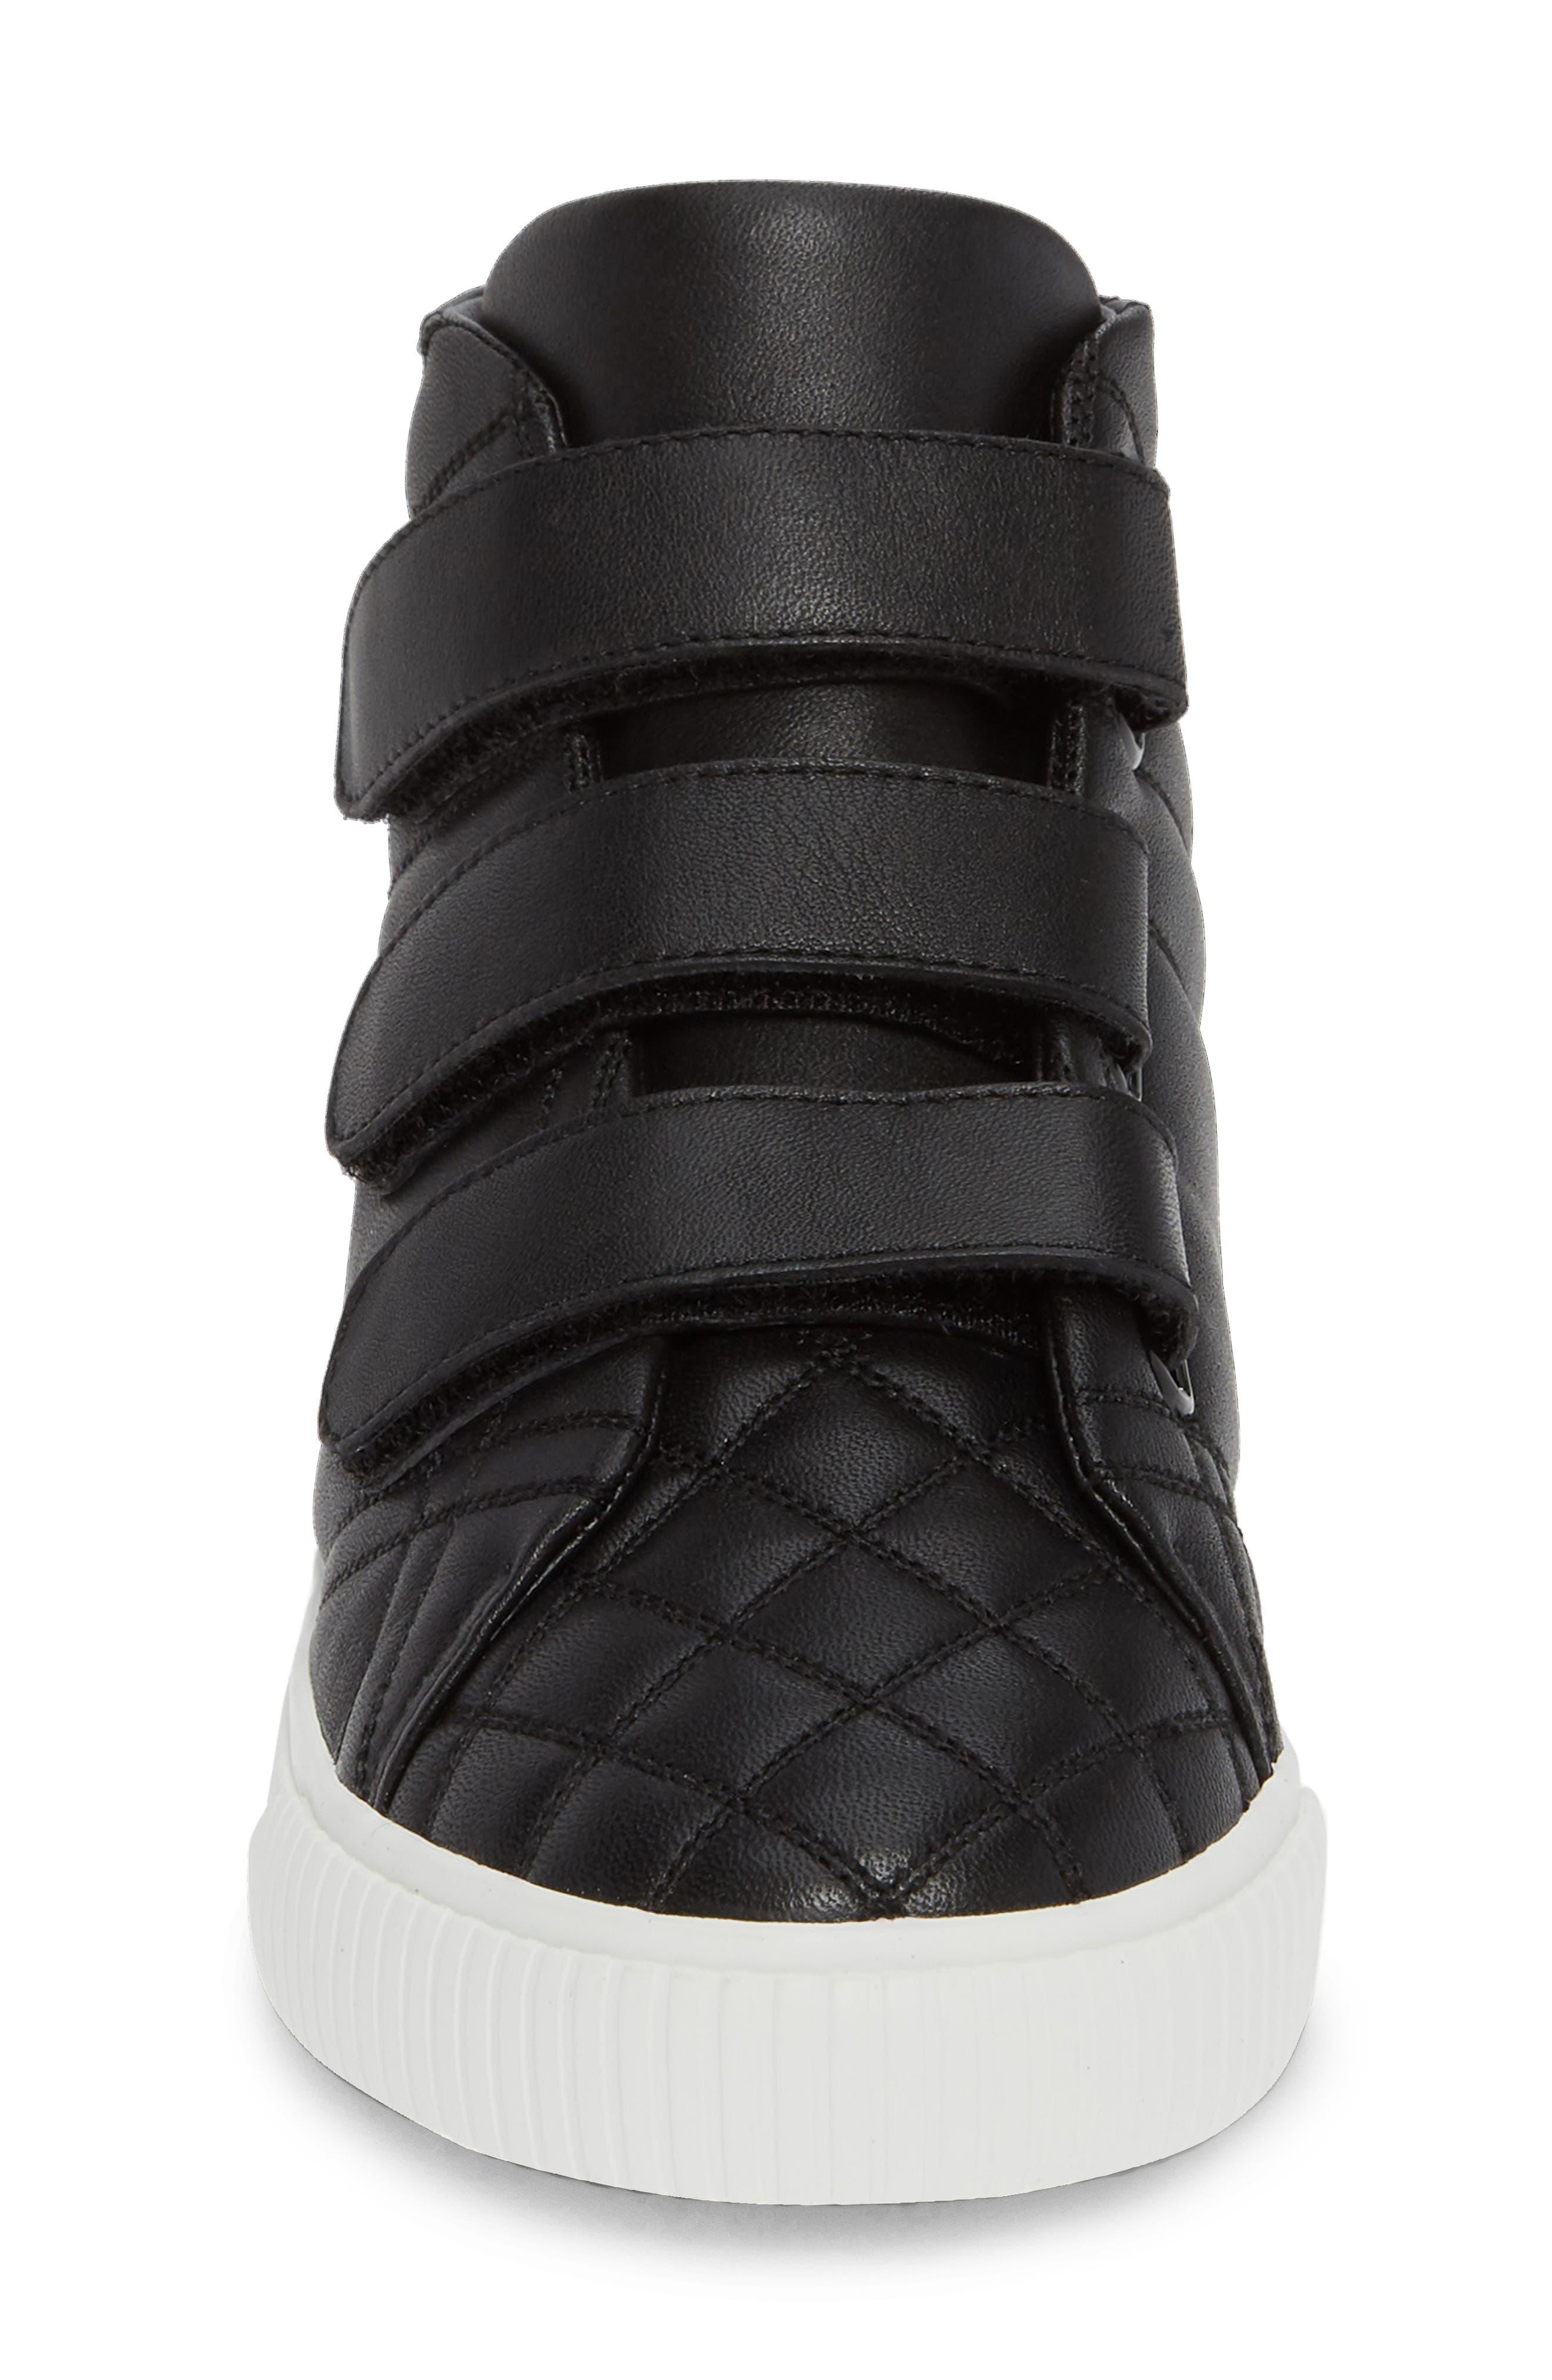 Sturrock Hi Top Sneaker,                             Alternate thumbnail 4, color,                             BLACK